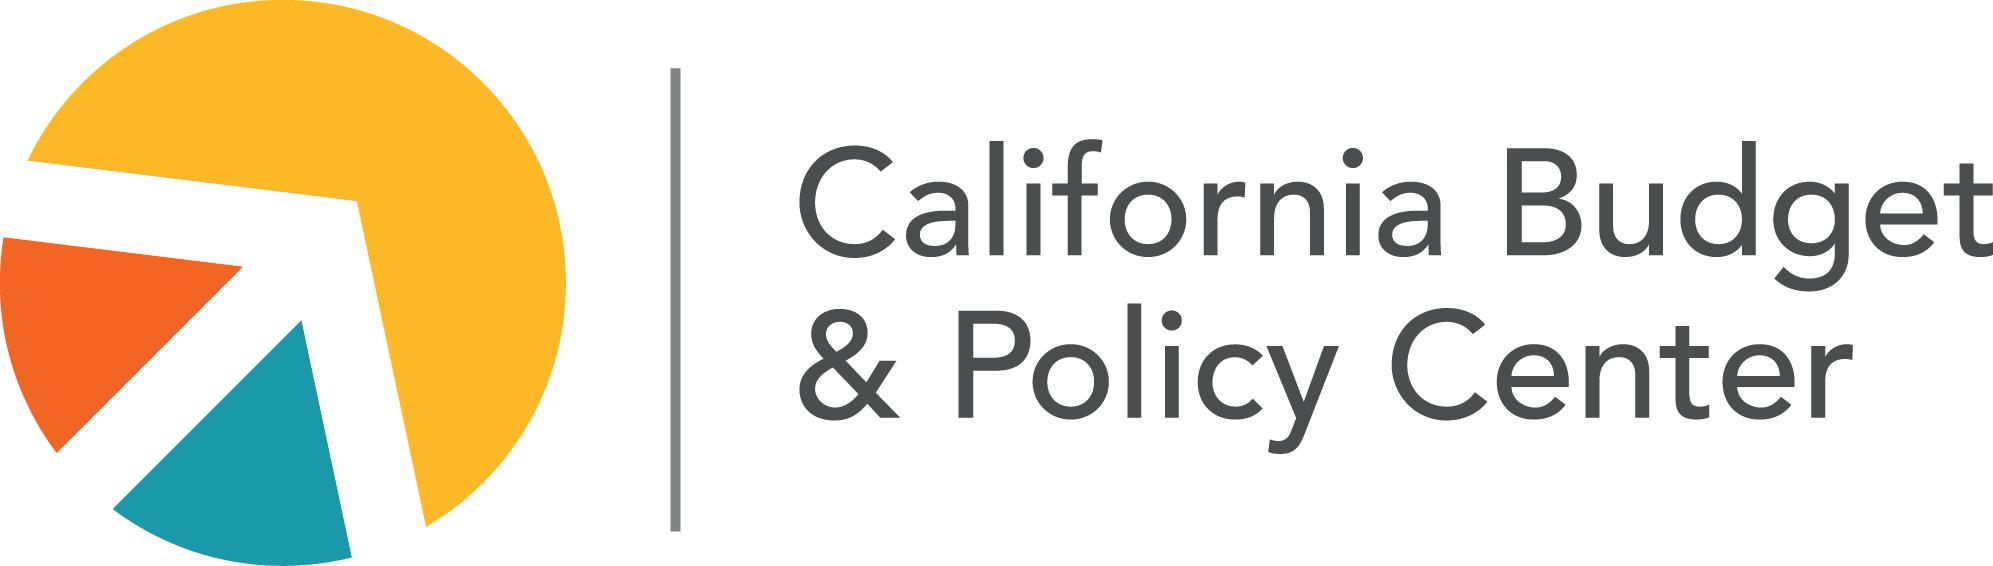 Image result for California Budget & Policy Center logo